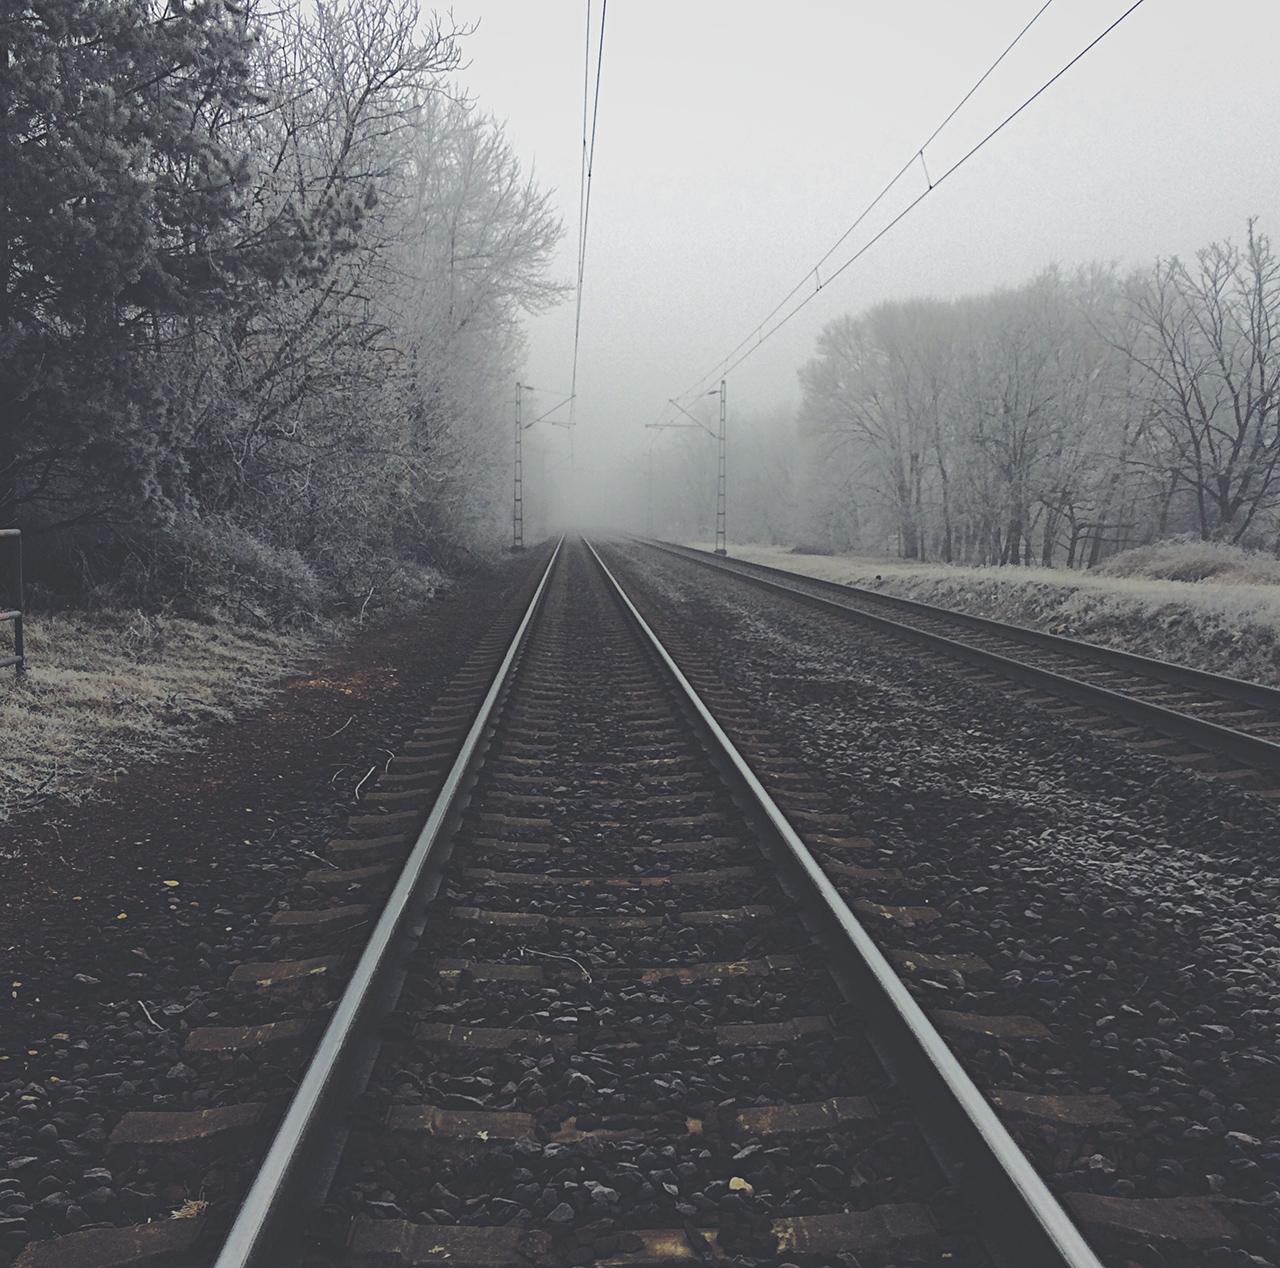 Fagyos köd